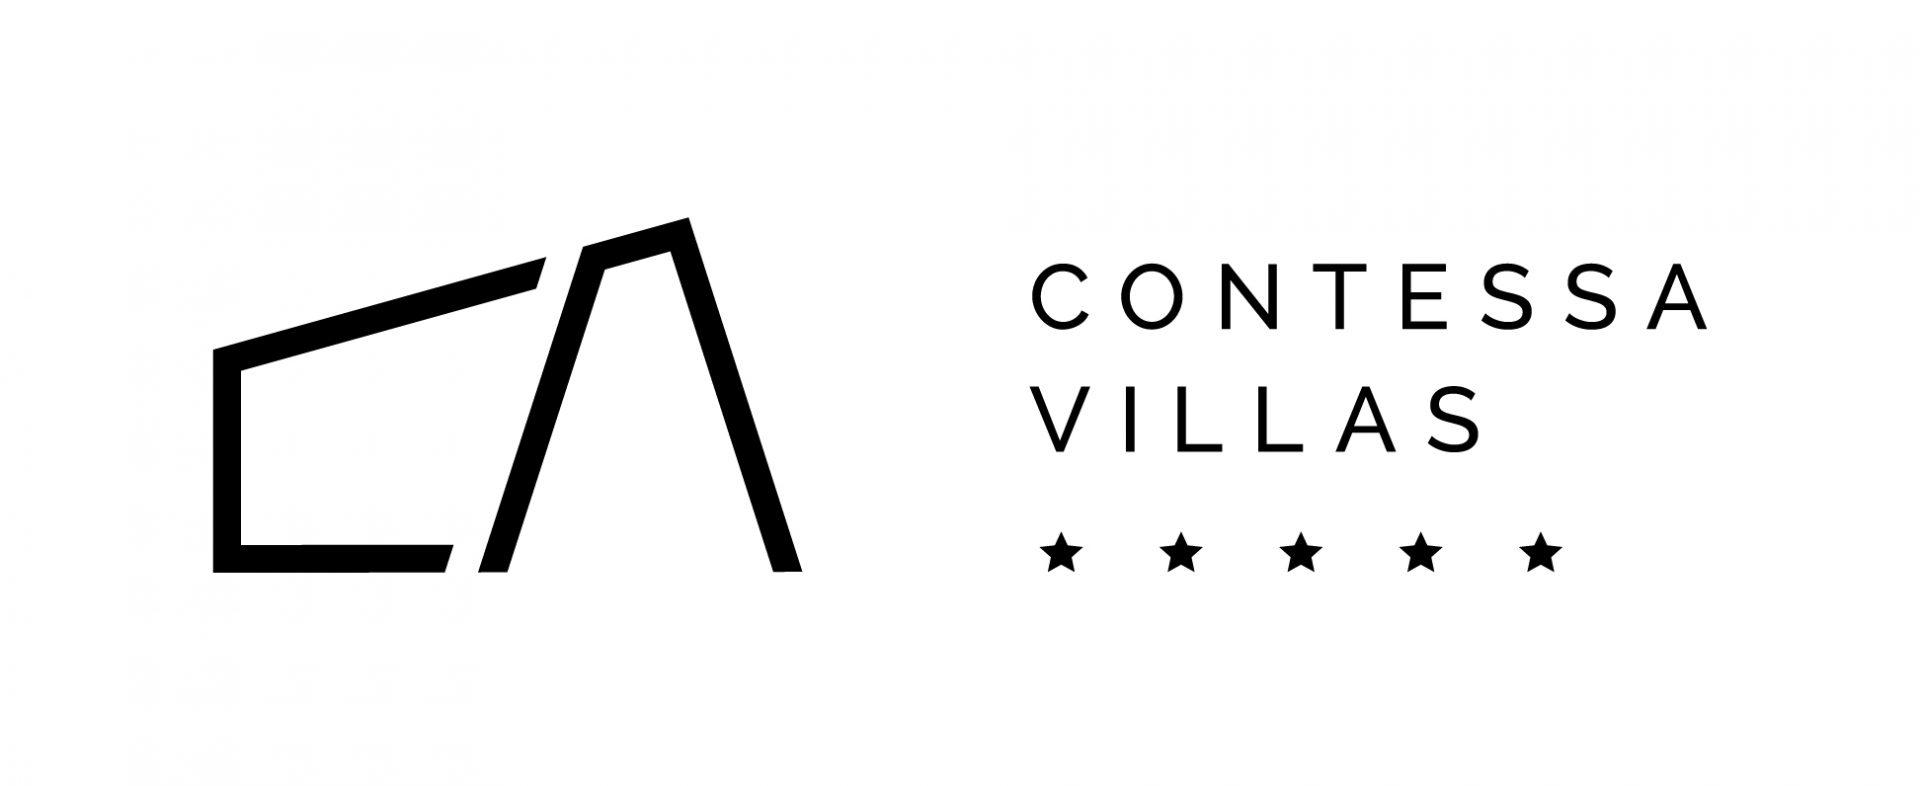 U agenciji Contessa Villas znaju kako vas zadiviti… Predstavljamo vam prekrasan novi Deluxe Complex Rova *****